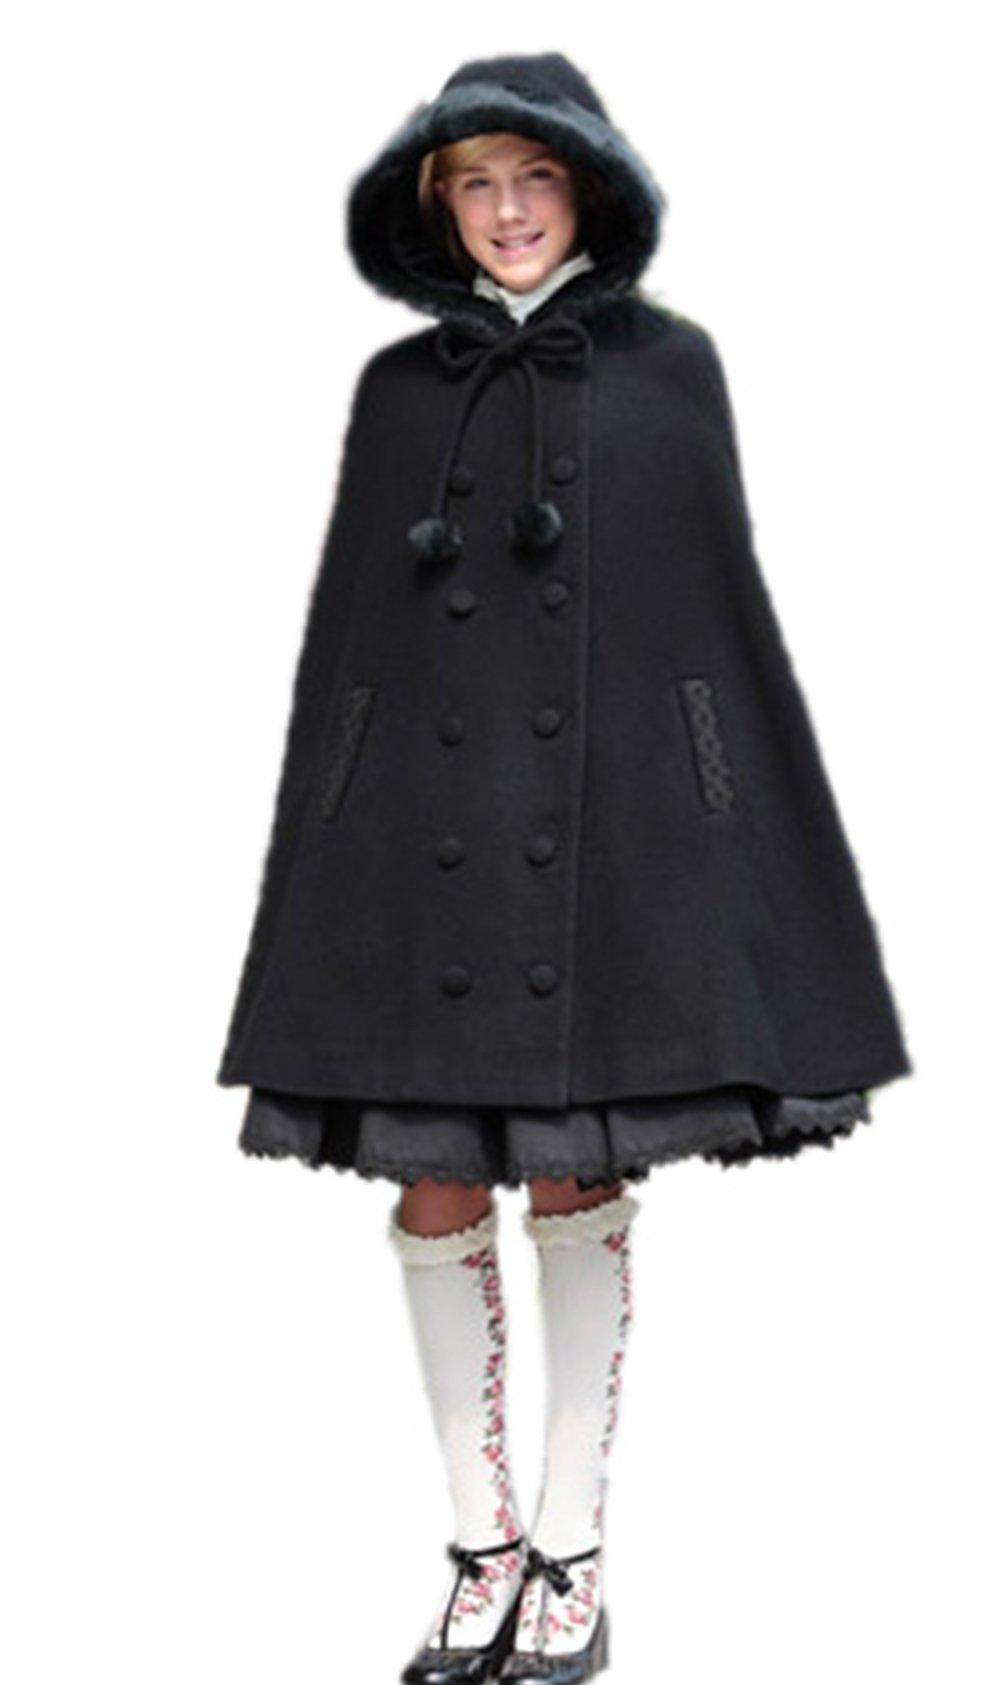 Nuoqi Sweet Girl Lolita Costume Winter Hooded Cloak Fashion Lady Wool Coat (Large, A-Black)